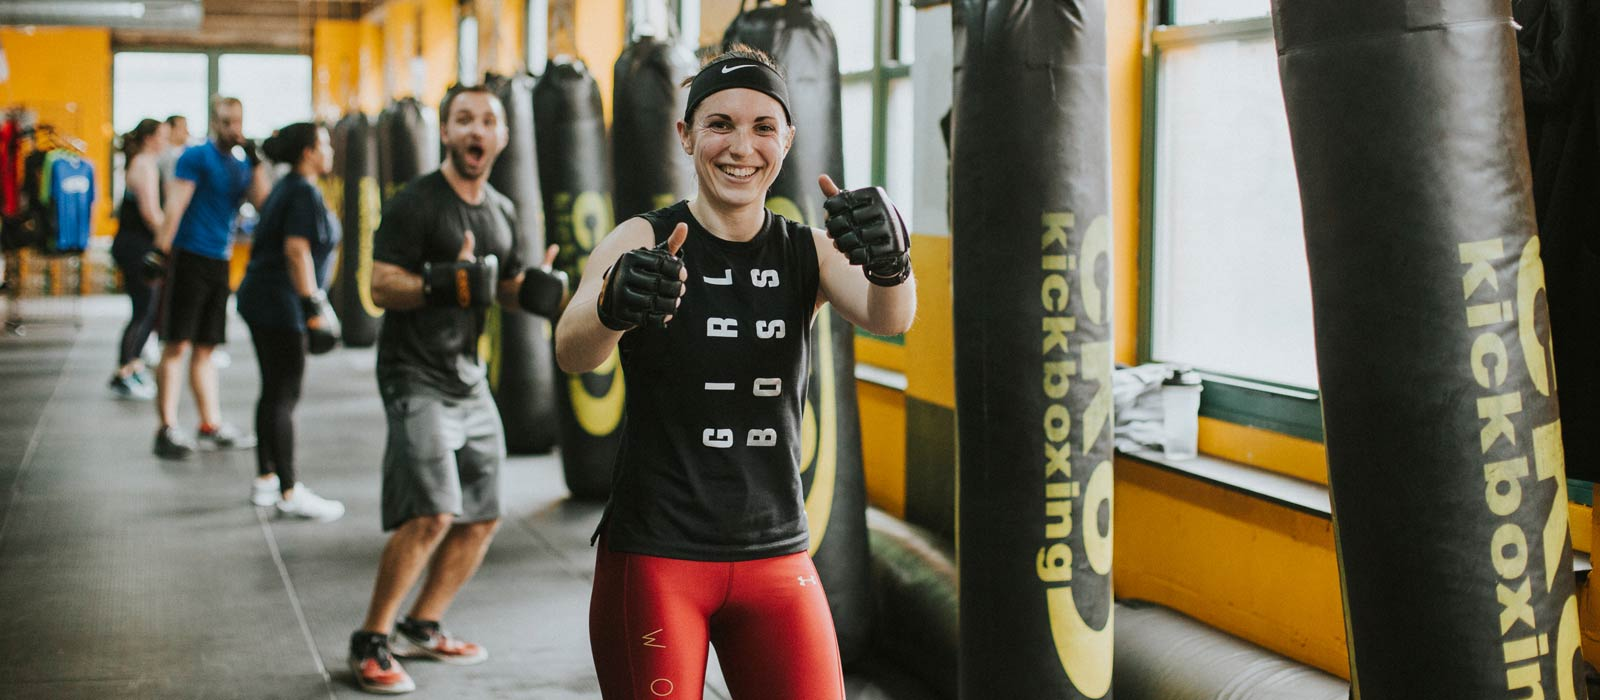 cko kickboxing, unleash the new you